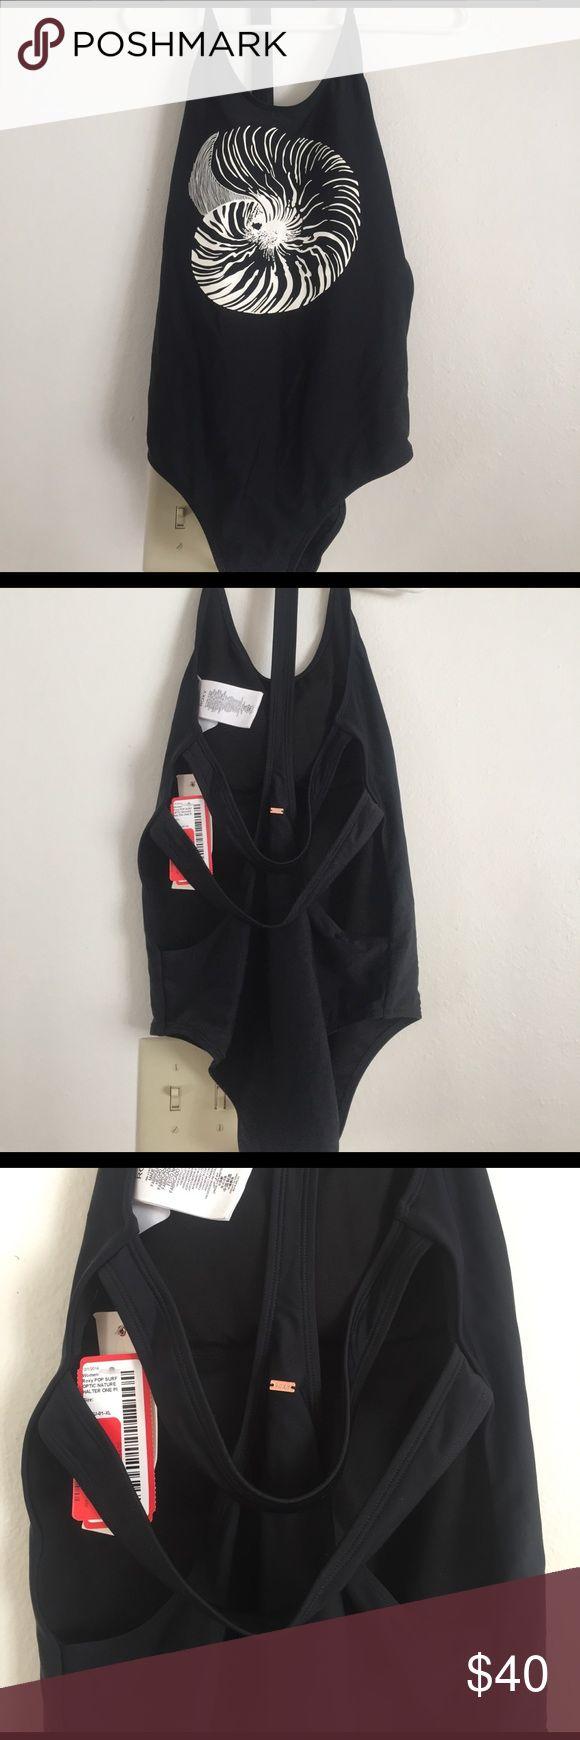 Roxy swimsuit Open stewpot back roxy suit Roxy Swim One Pieces